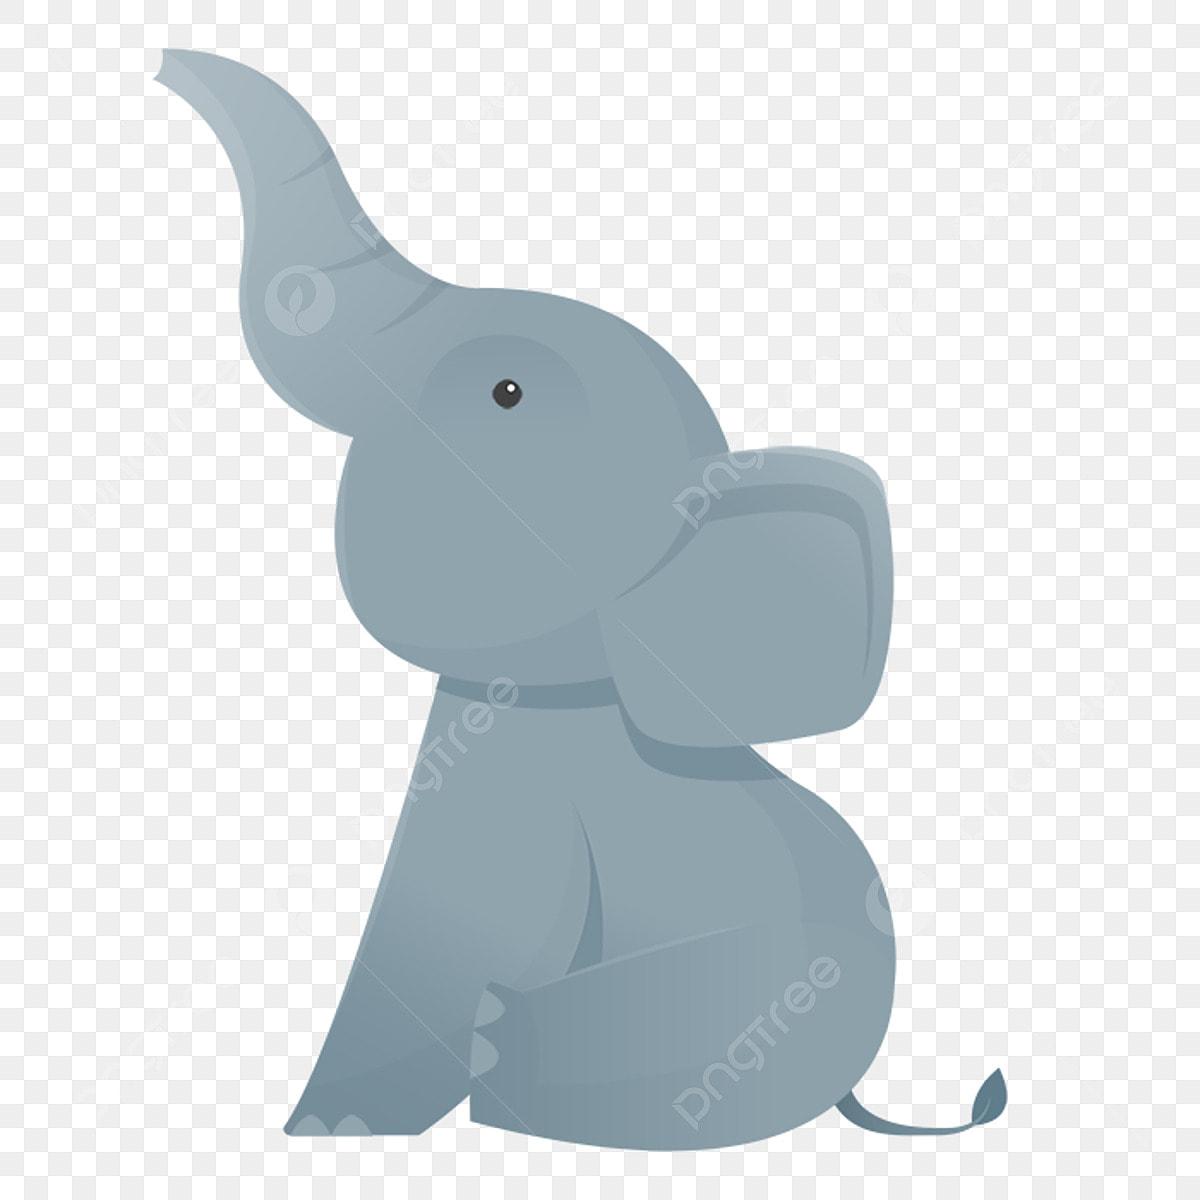 Cute Elephant Elephant Clipart Cute Clipart Cartoon Png